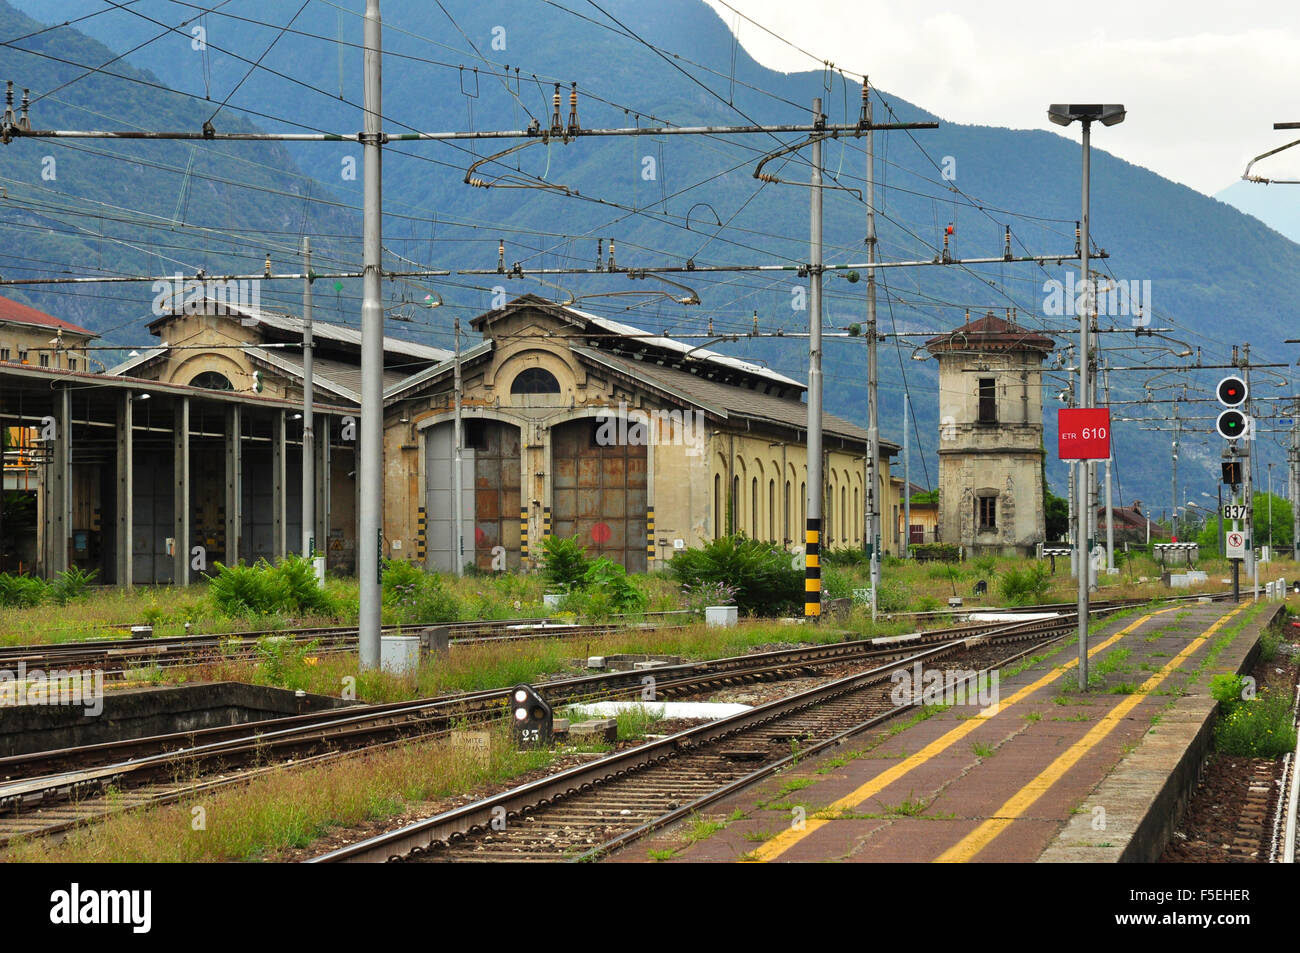 Bahntechnische Bauten und Infrastruktur, Domodossola, Italien Stockbild